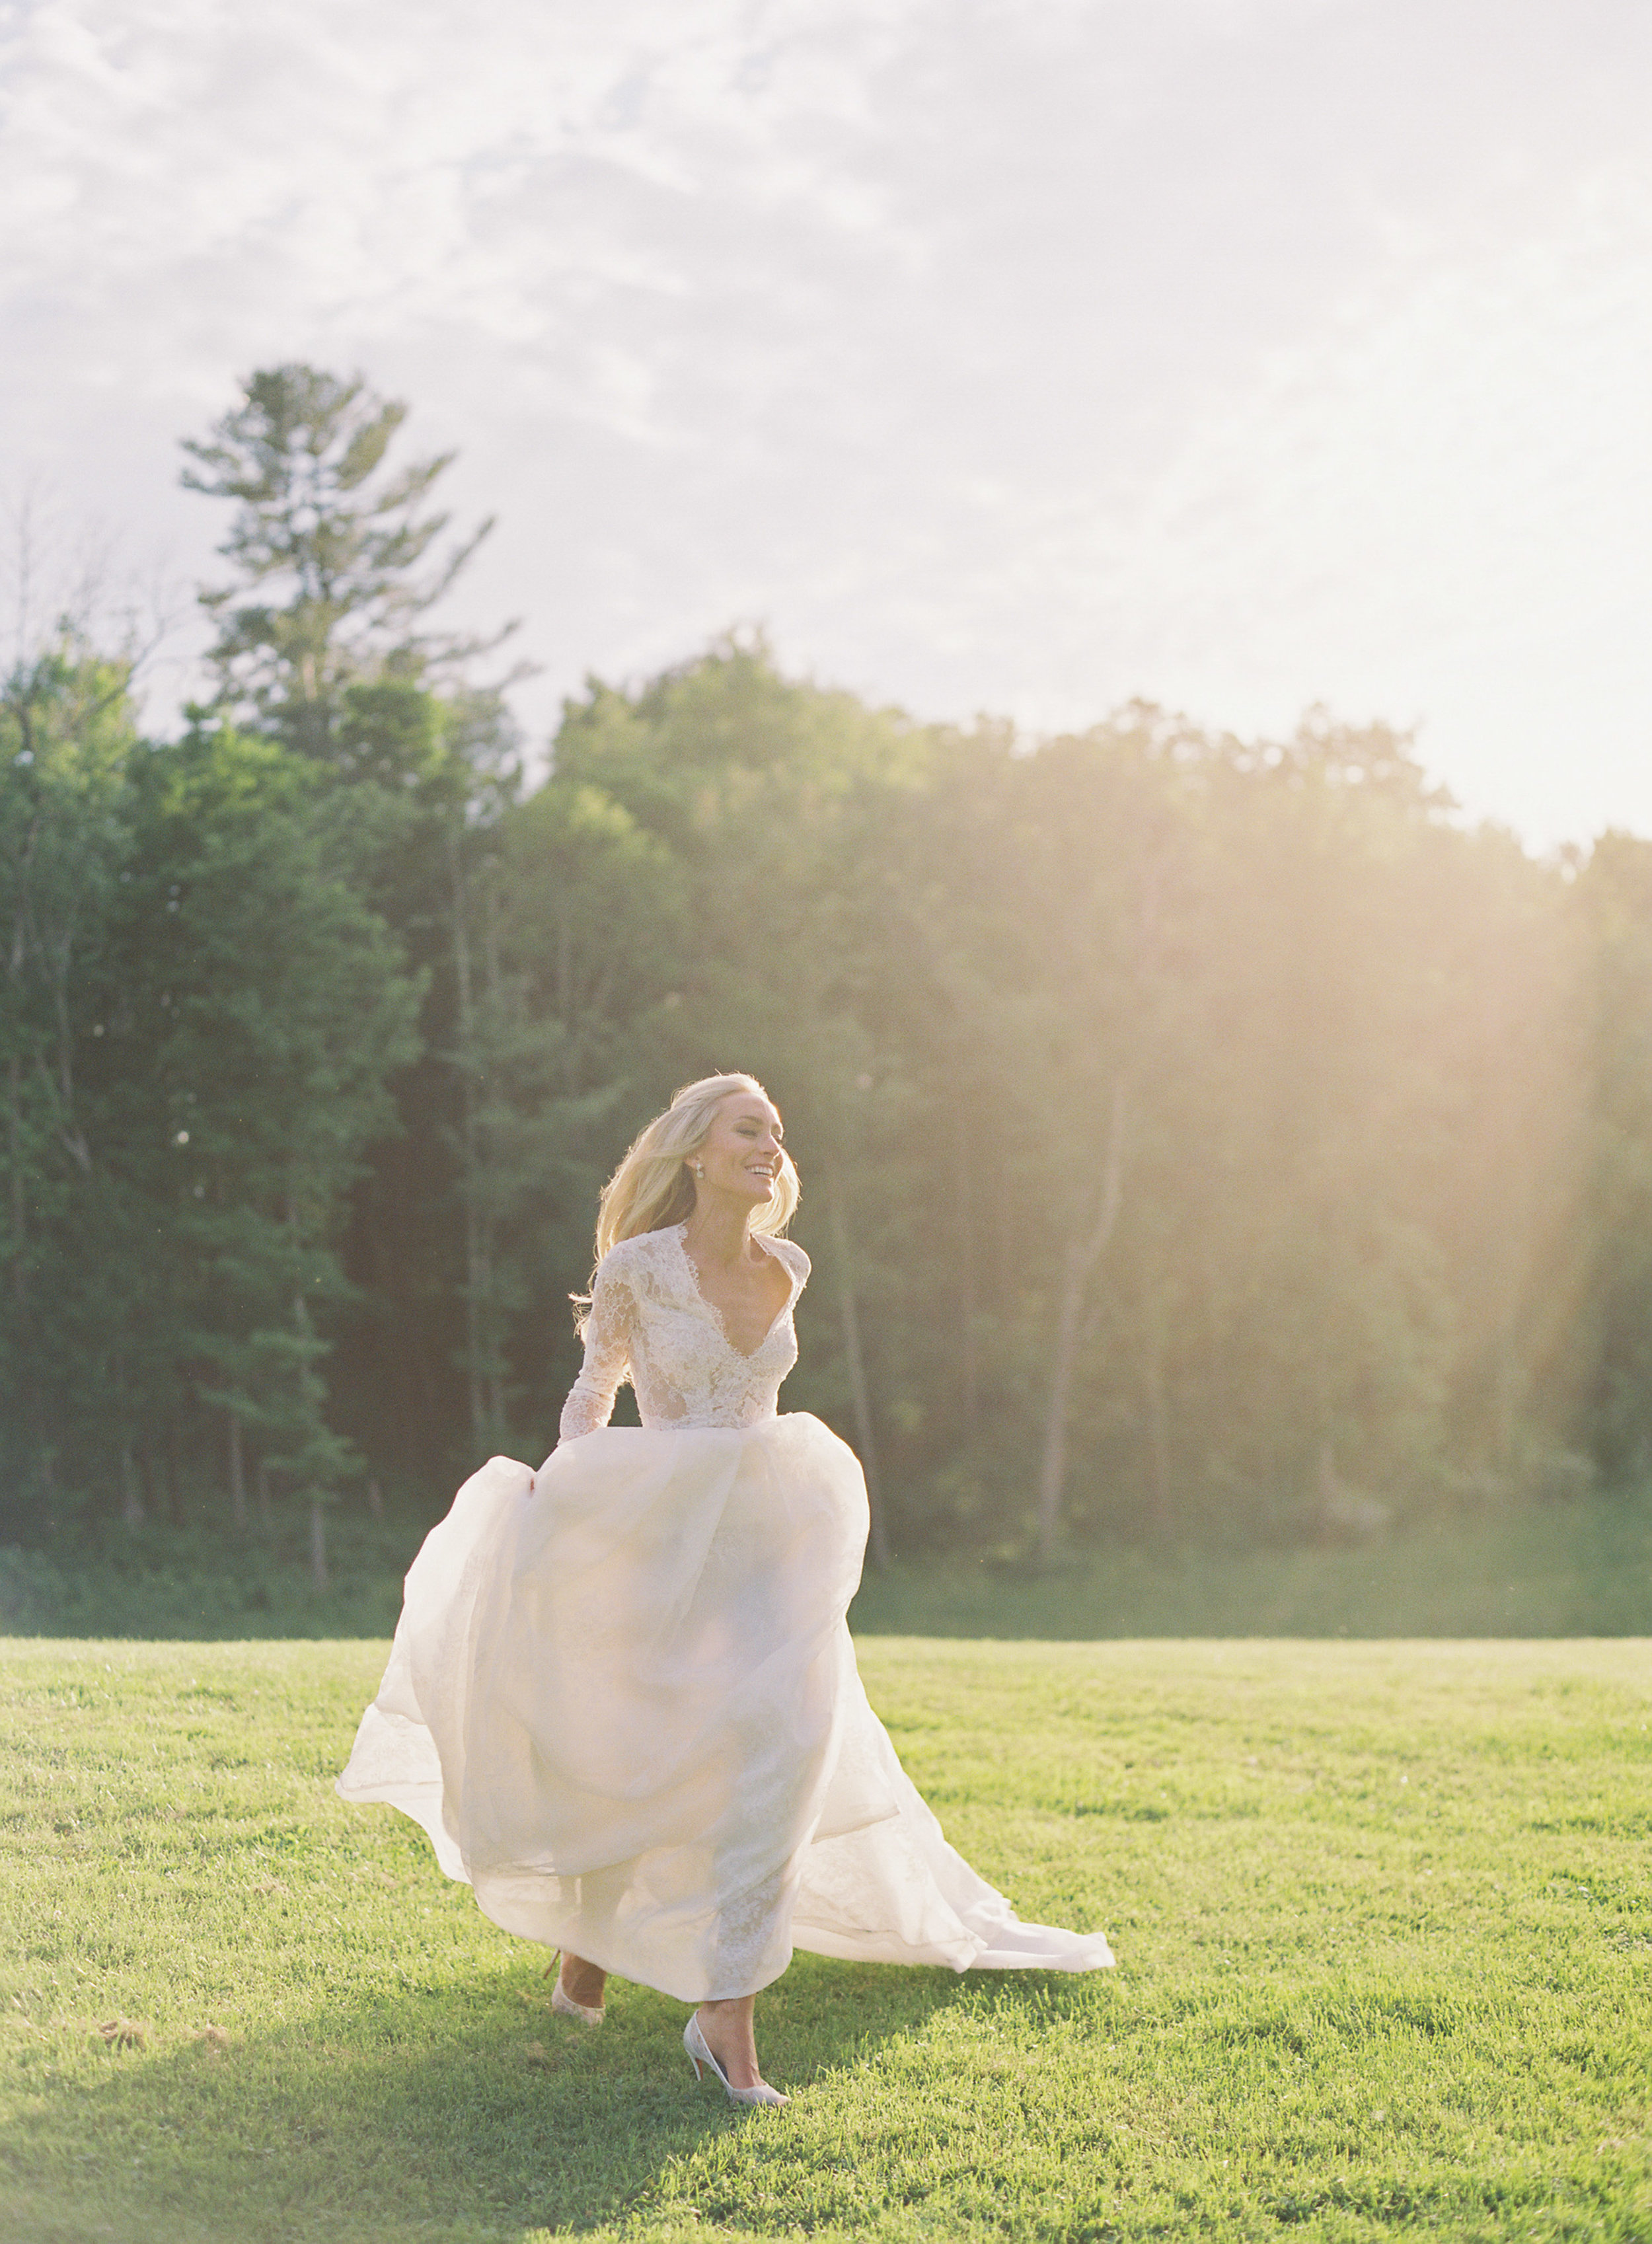 Ankony_Farm_Wedding-200-Jen-Huang-AS-402-Jen-Huang-003148-R1-006.jpg